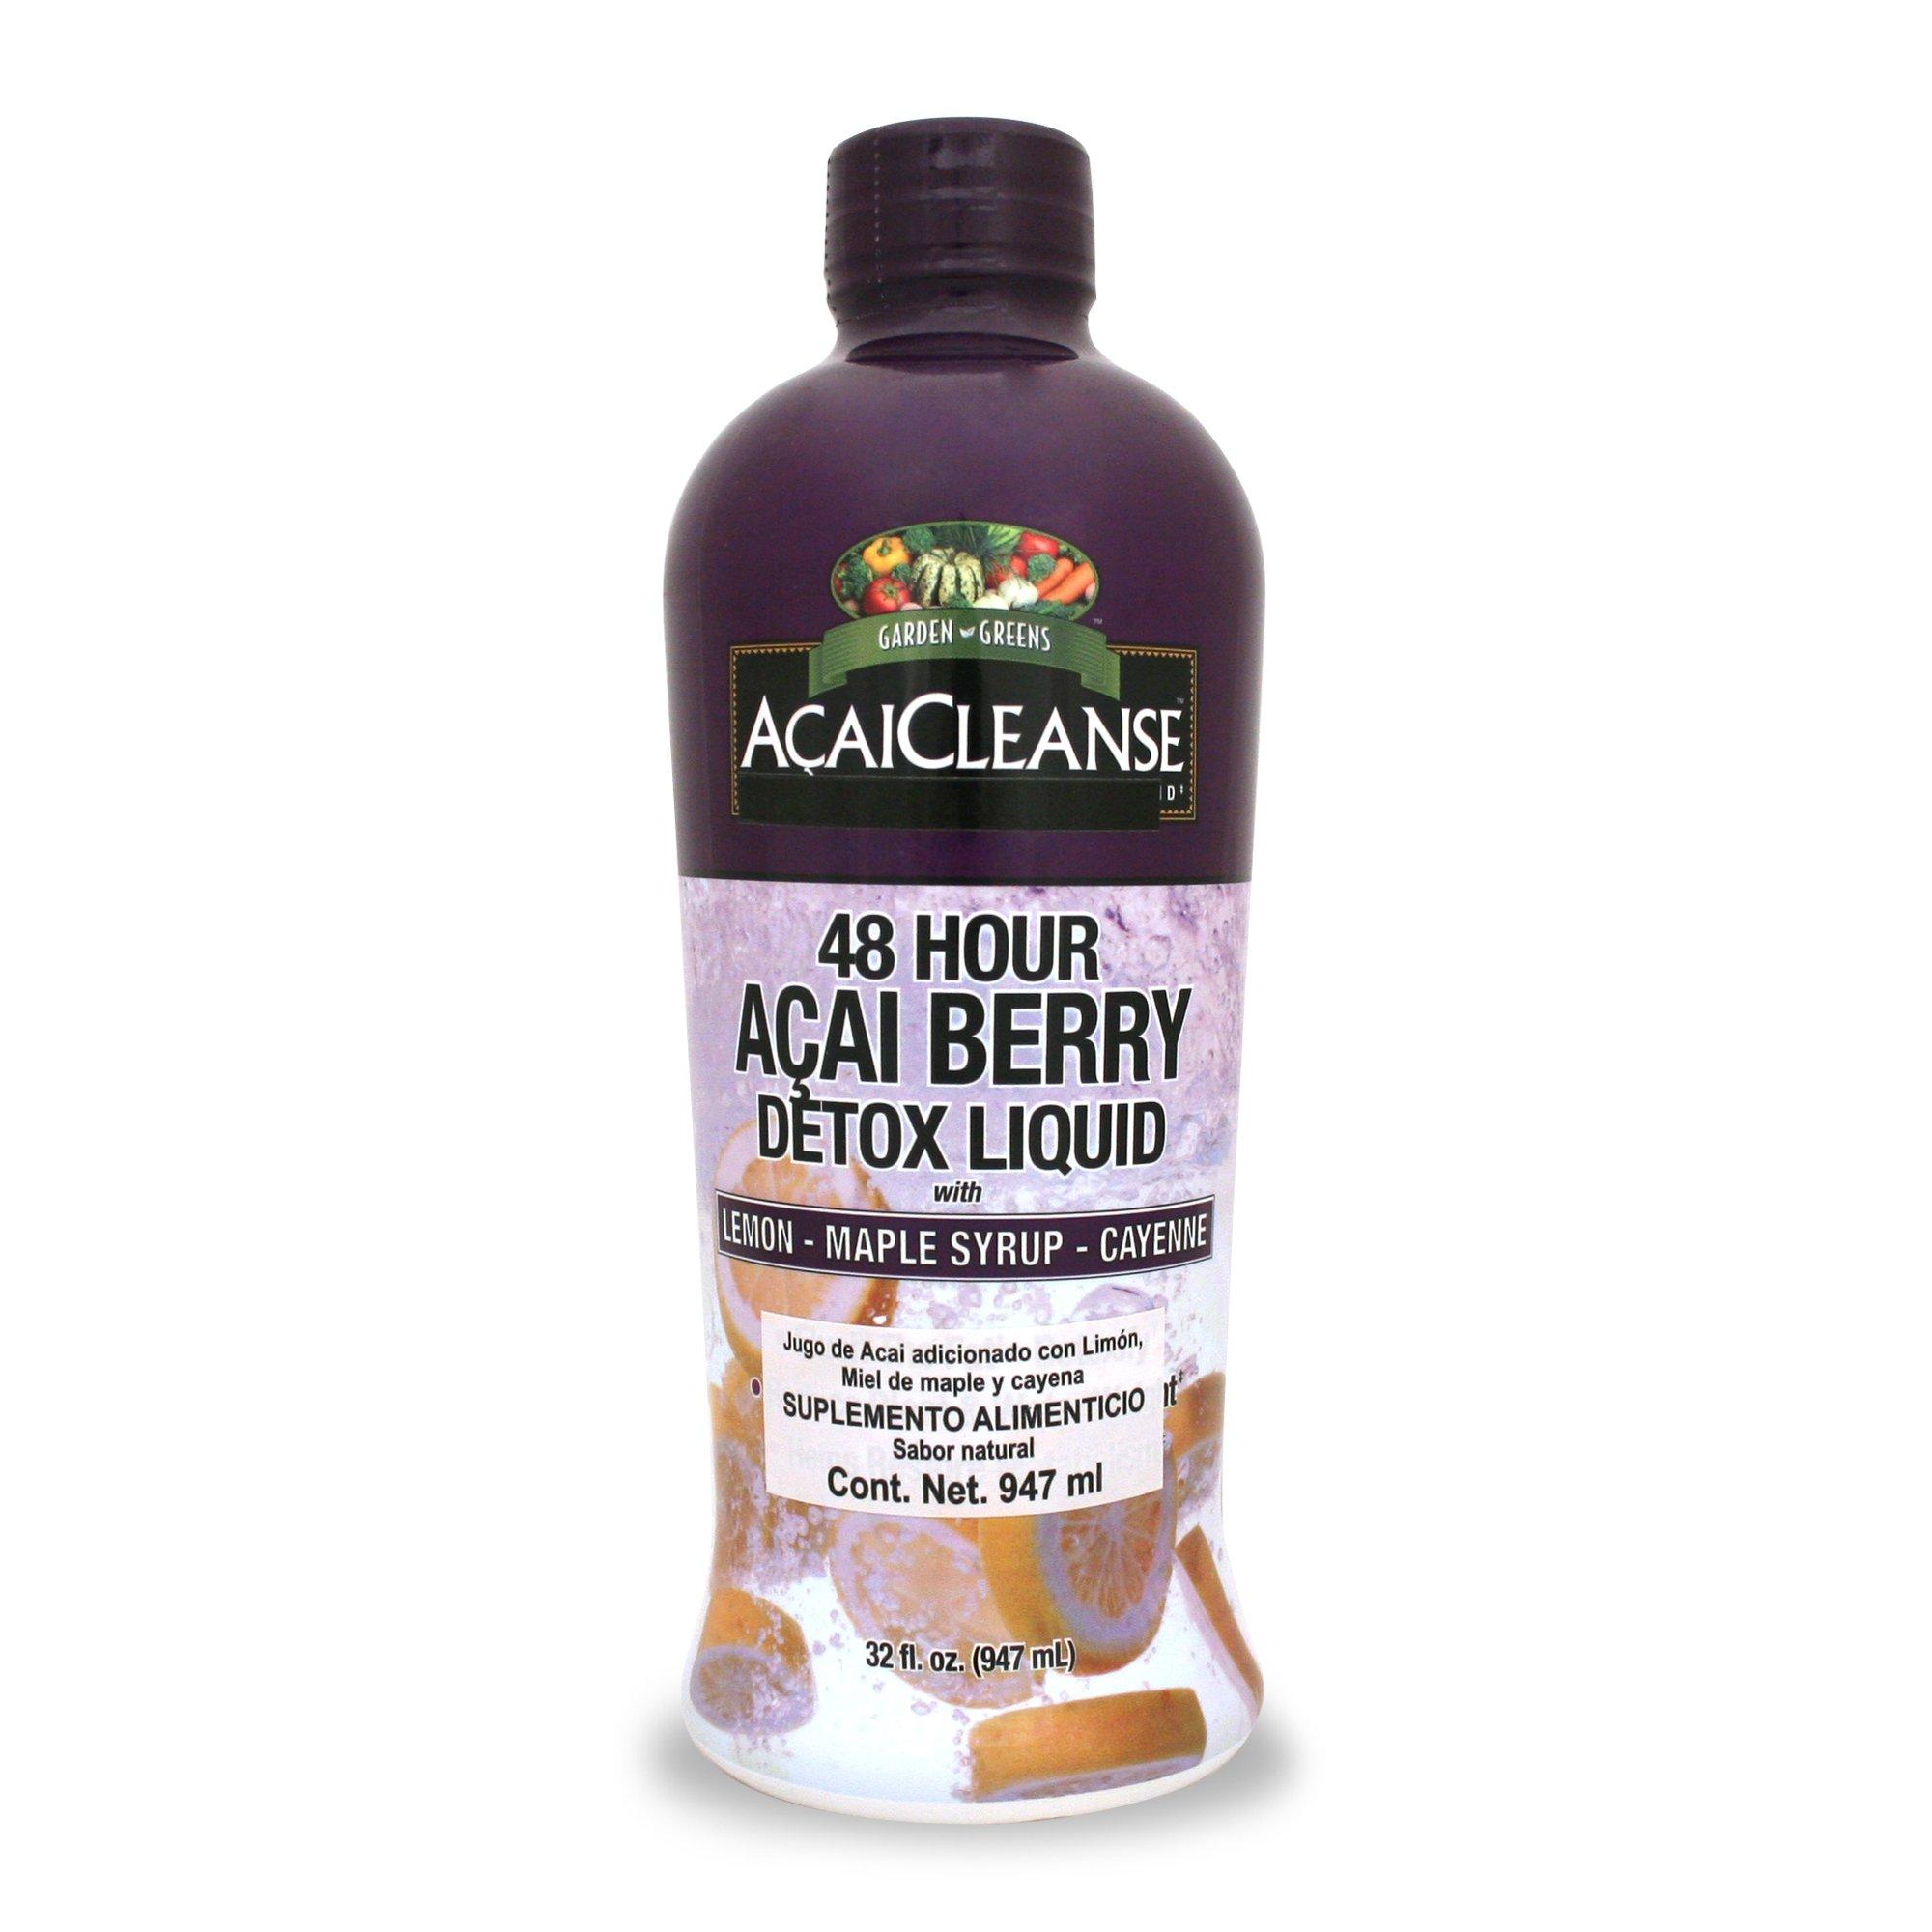 Amazon.com: 2 Day Juice Cleanse Natural Diet & Detox